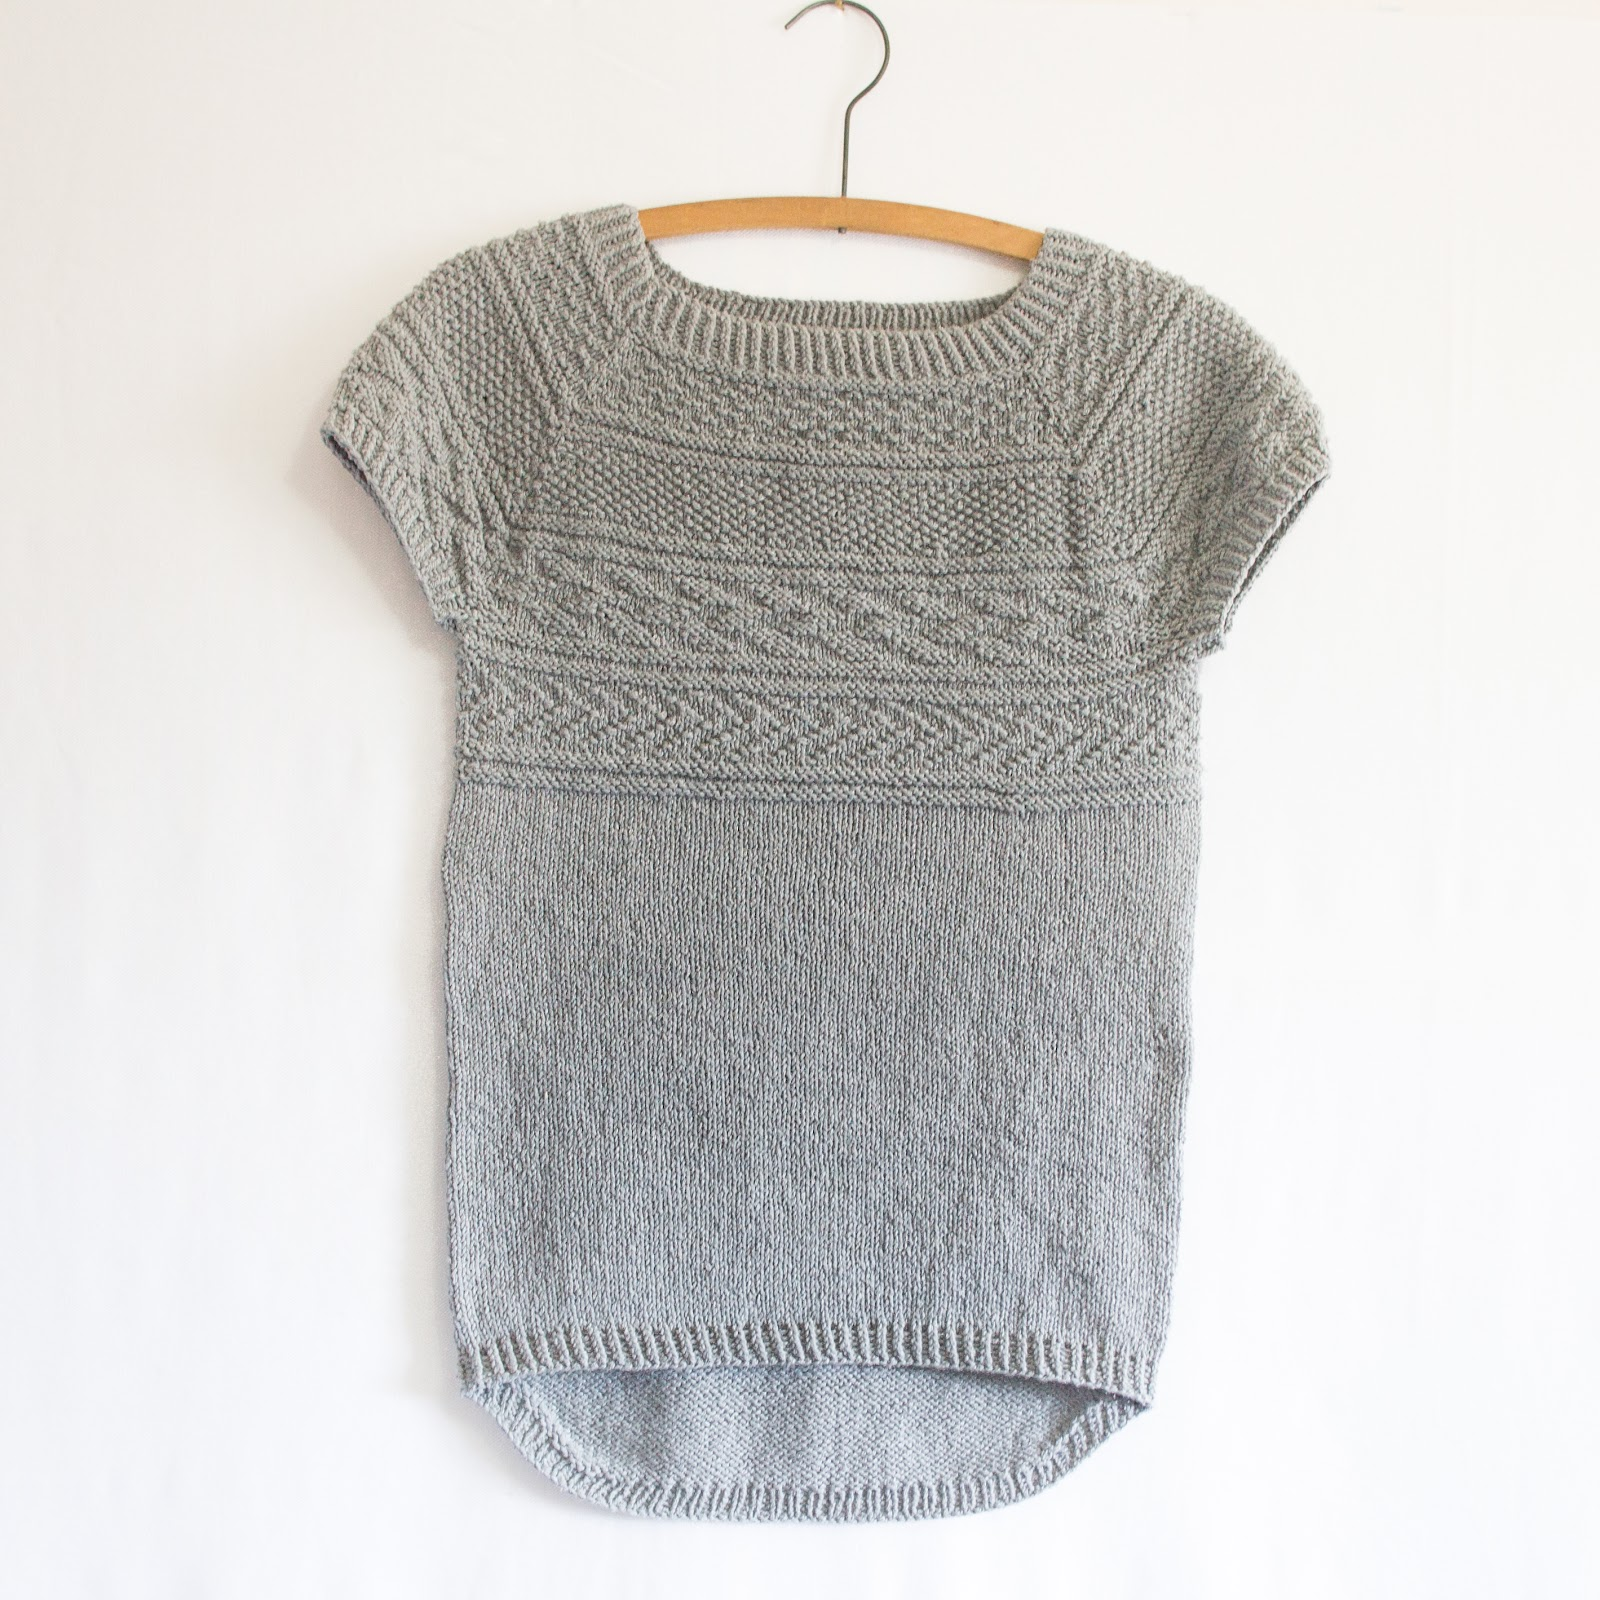 Knitting Patterns Summer Tops : Battersea (free pattern) Knitbug